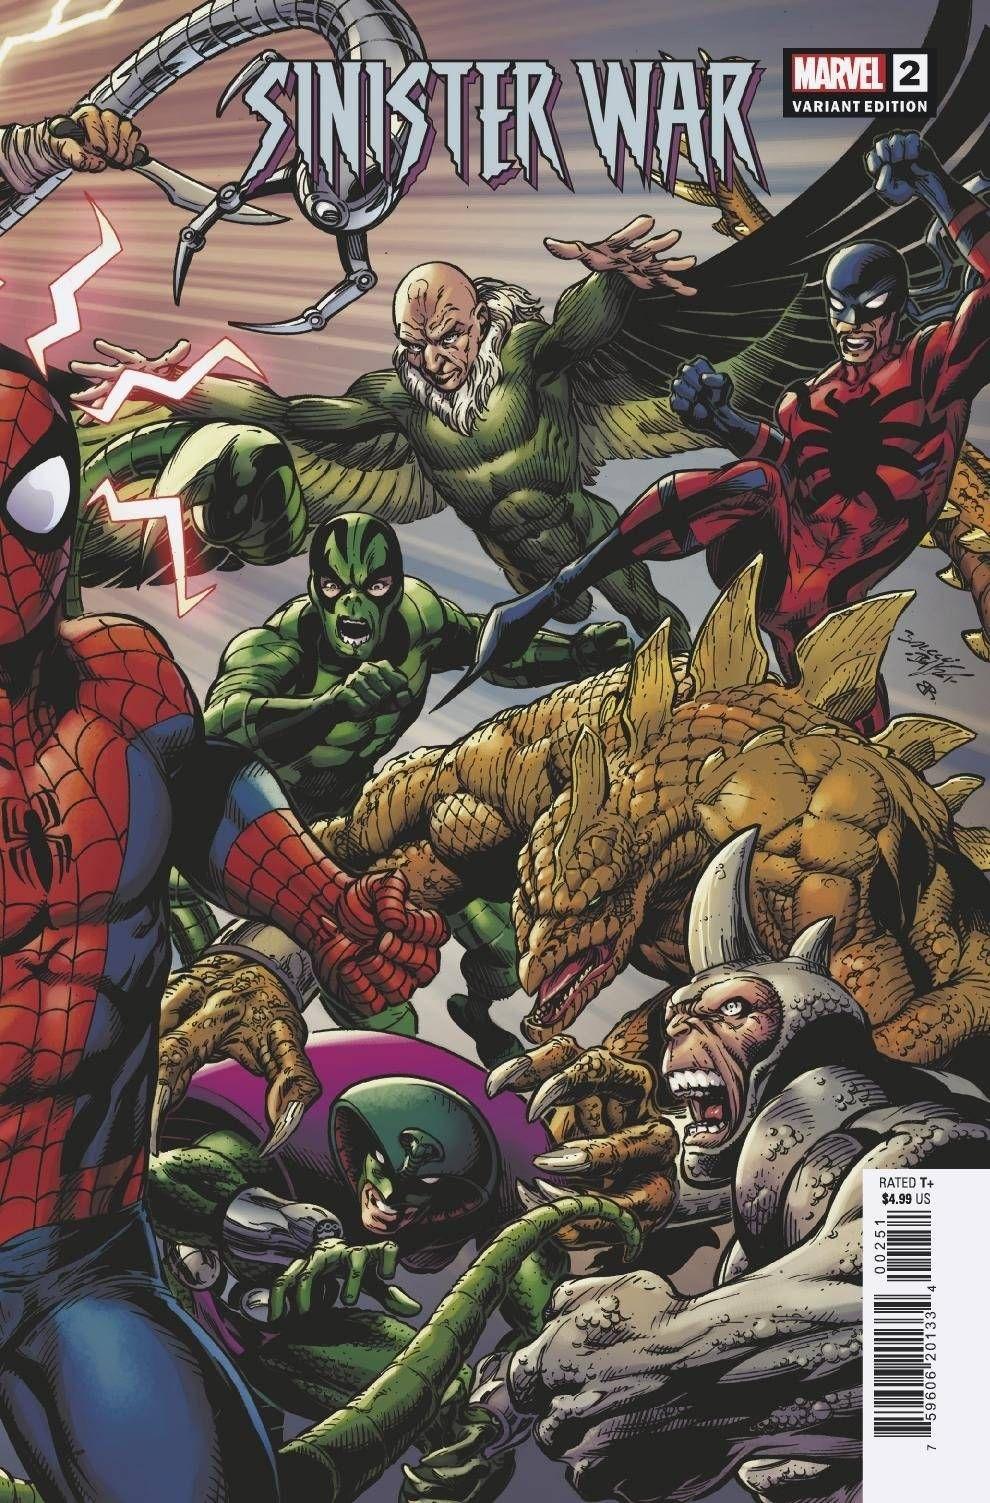 eyJidWNrZXQiOiJnb2NvbGxlY3QuaW1hZ2VzLnB1YiIsImtleSI6IjFkNjljNGQ1LWU0NmQtNDliNy05NWEyLTZlMTFlMDAzMzliMC5qcGciLCJlZGl0cyI6W119 ComicList: Marvel Comics New Releases for 08/04/2021